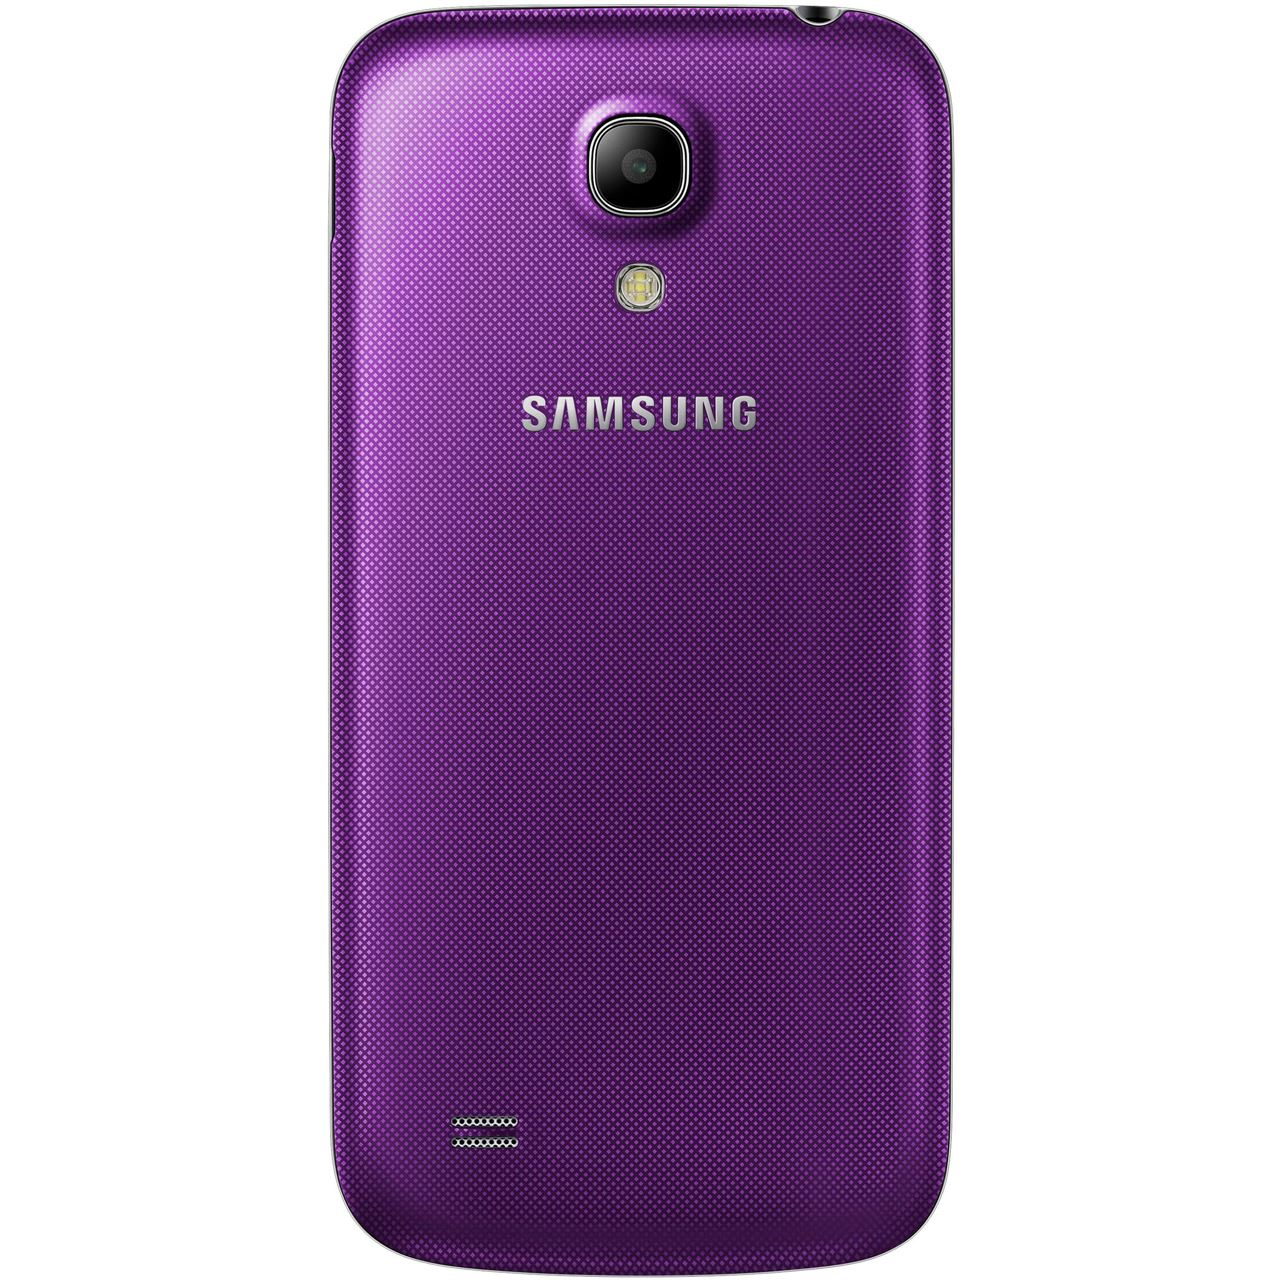 samsung galaxy s4 mini i9195 8 gb violett smartphones. Black Bedroom Furniture Sets. Home Design Ideas